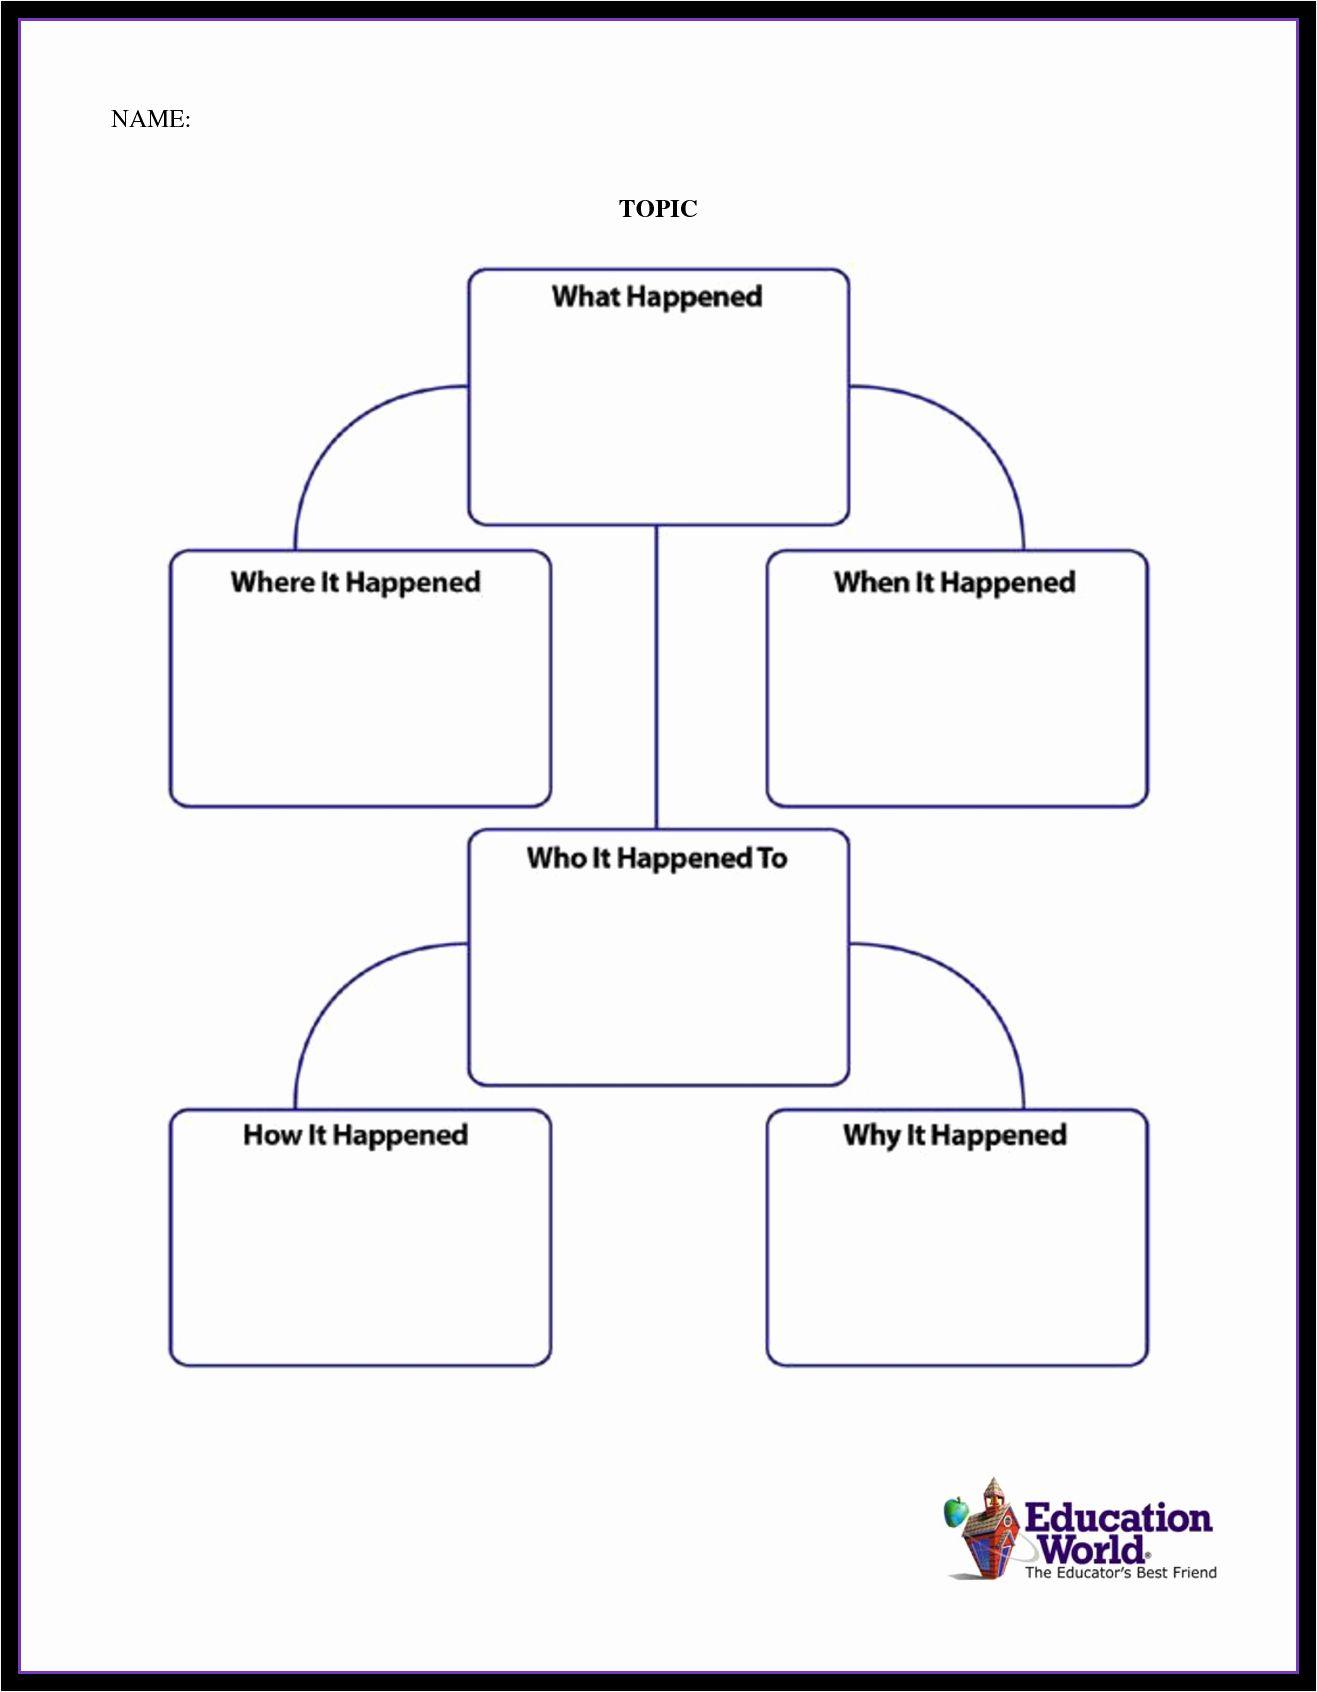 Blank Flowchart Template Lovely Template Flowchart Flow Charts Templates In 2020 Process Flow Chart Template Mind Map Template Flow Chart Template